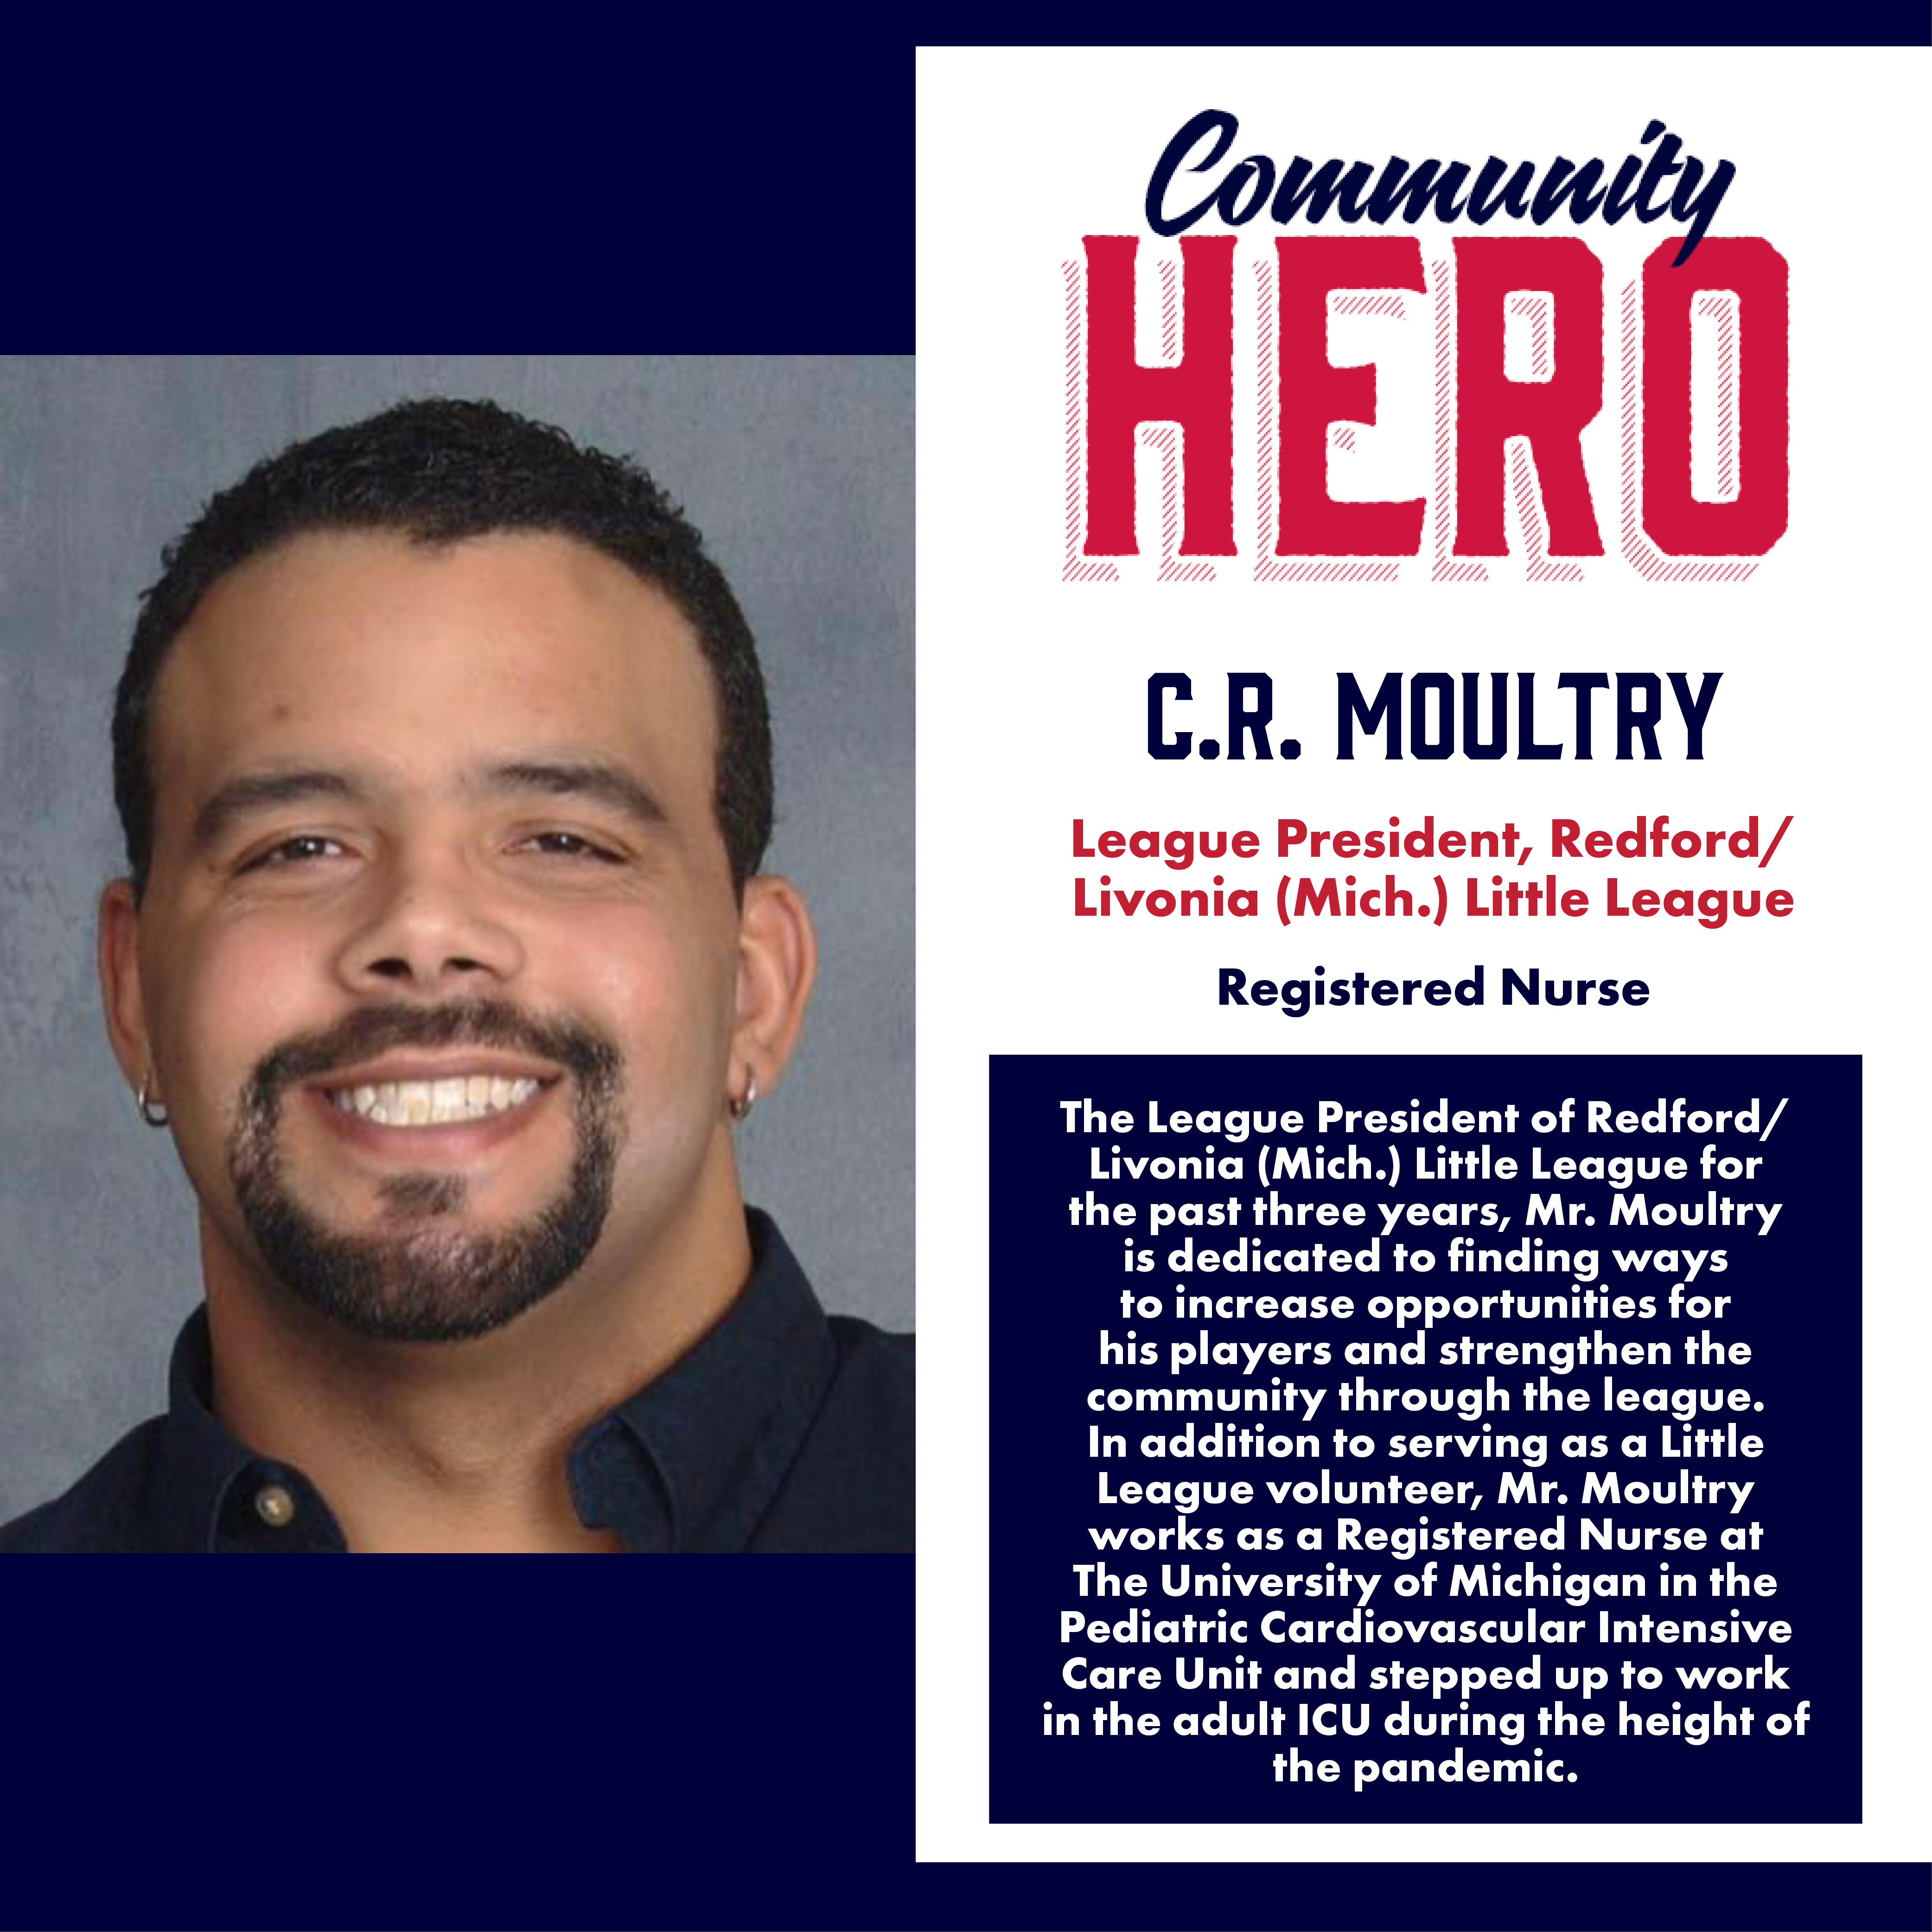 C.R. Moultry Community Hero